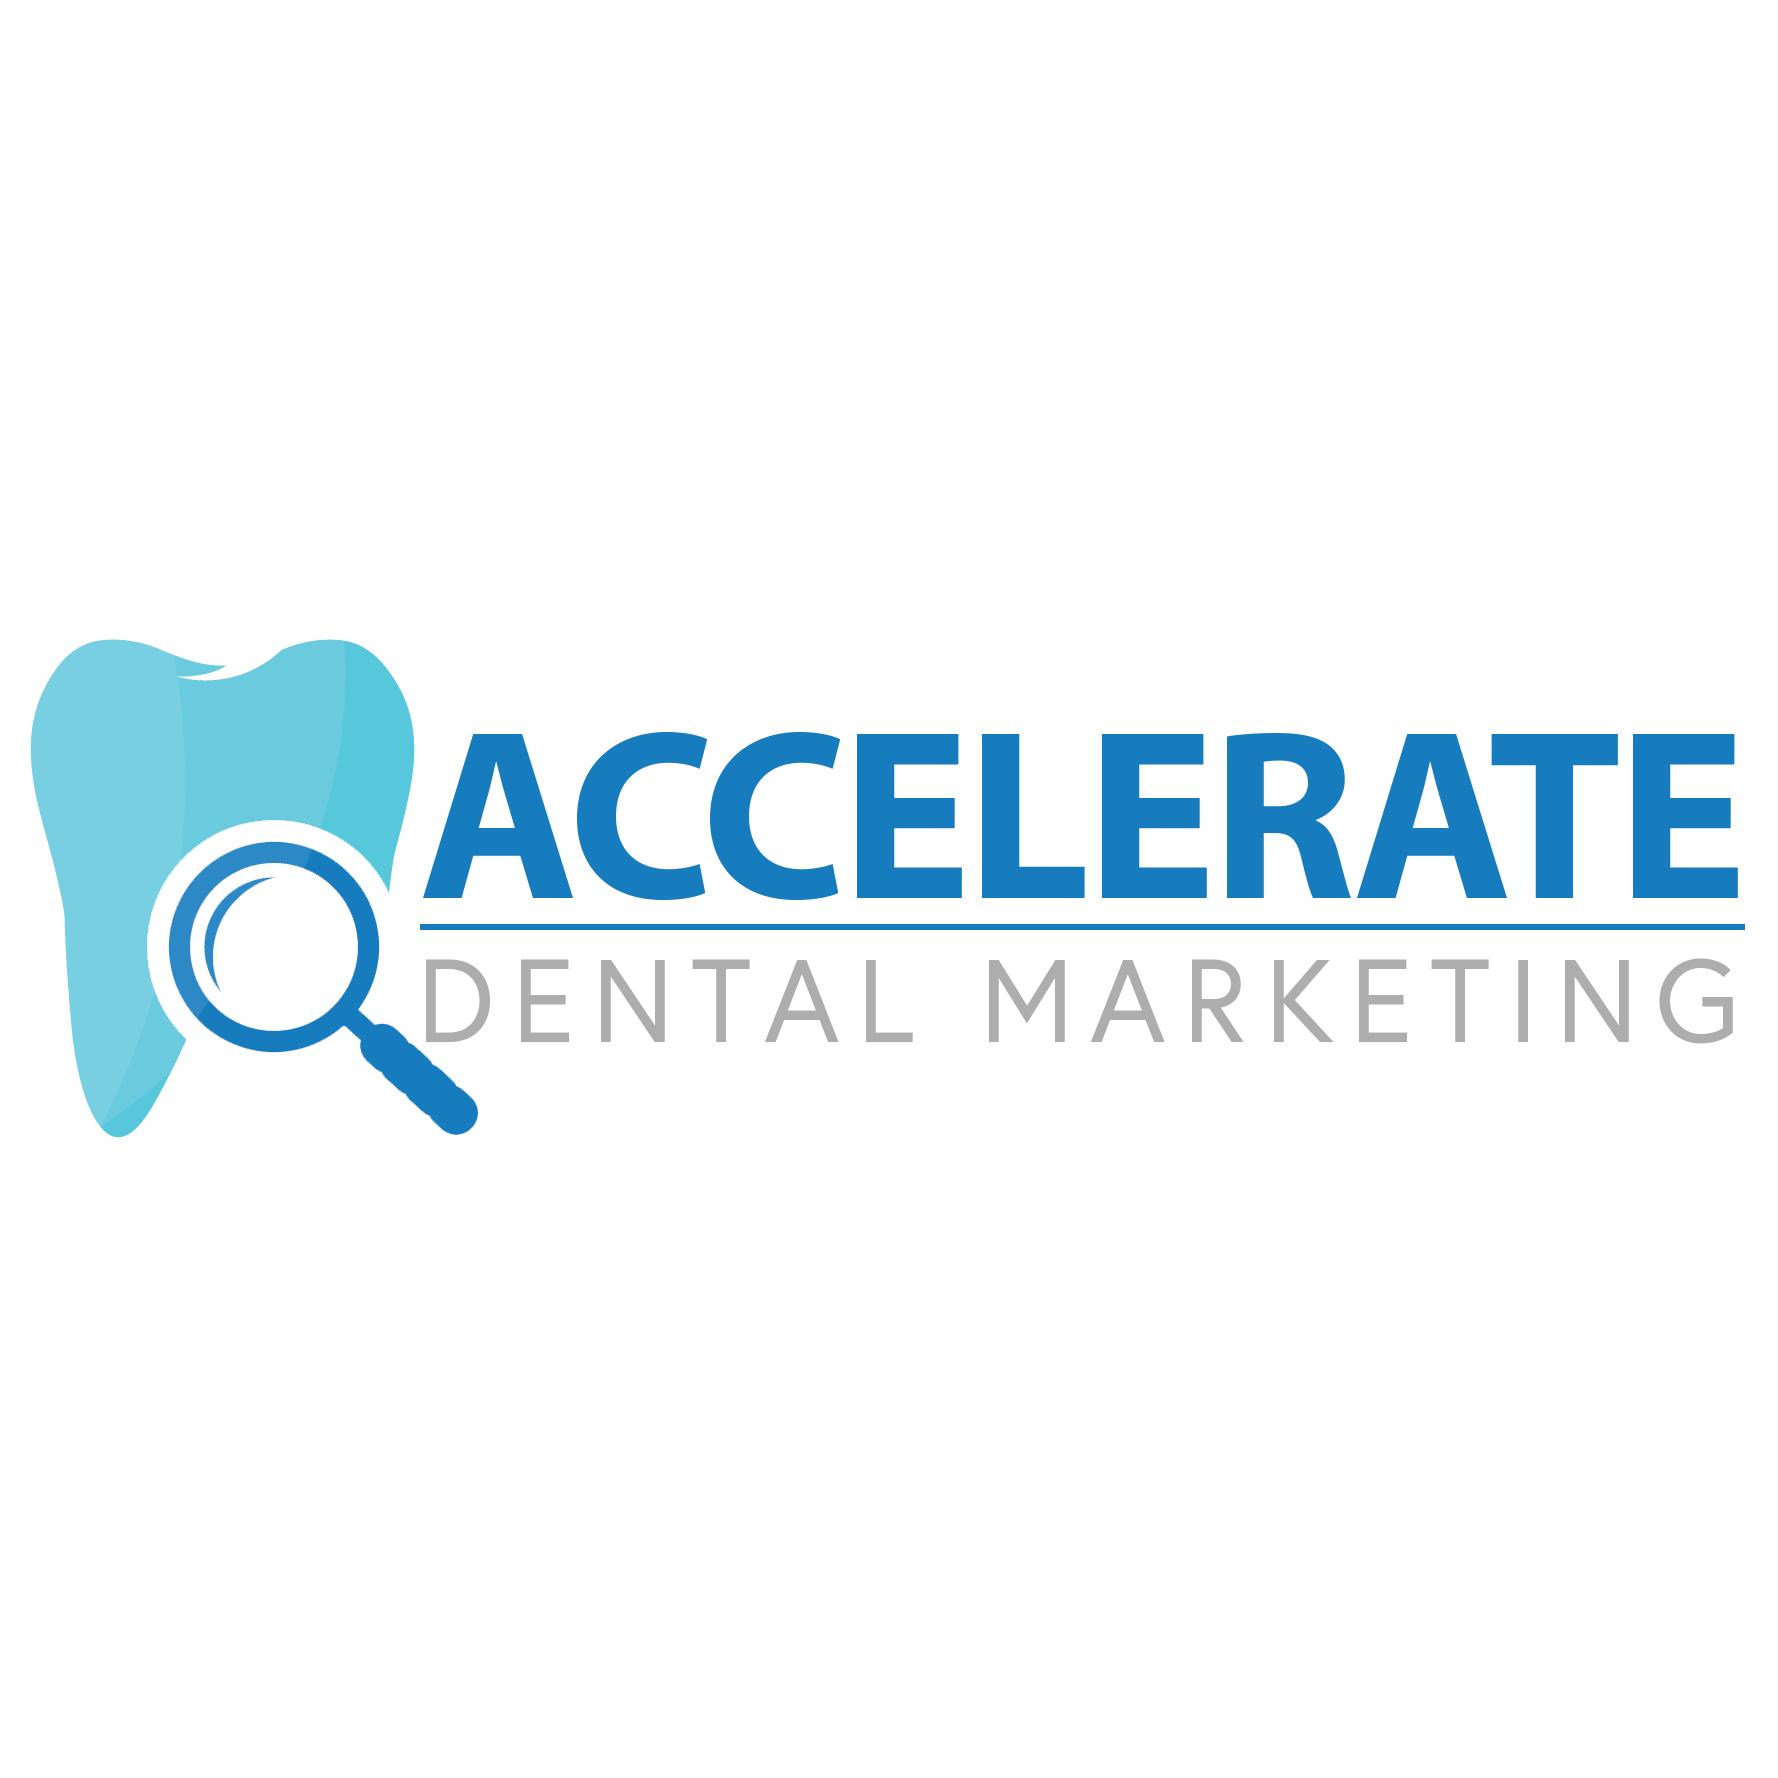 Accelerate Dental Marketing